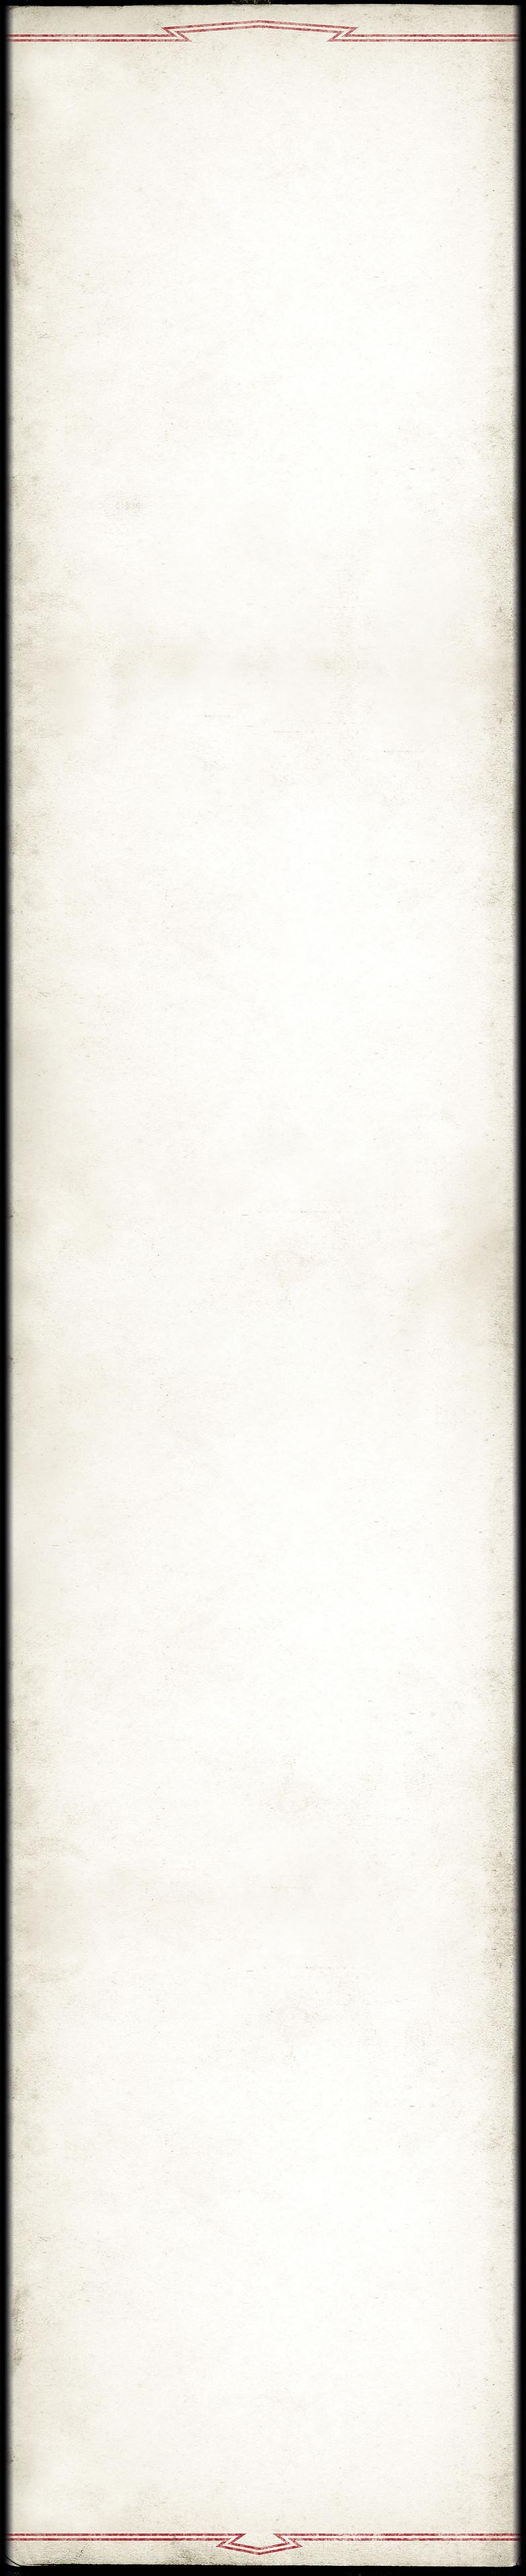 Paper_4x.jpg